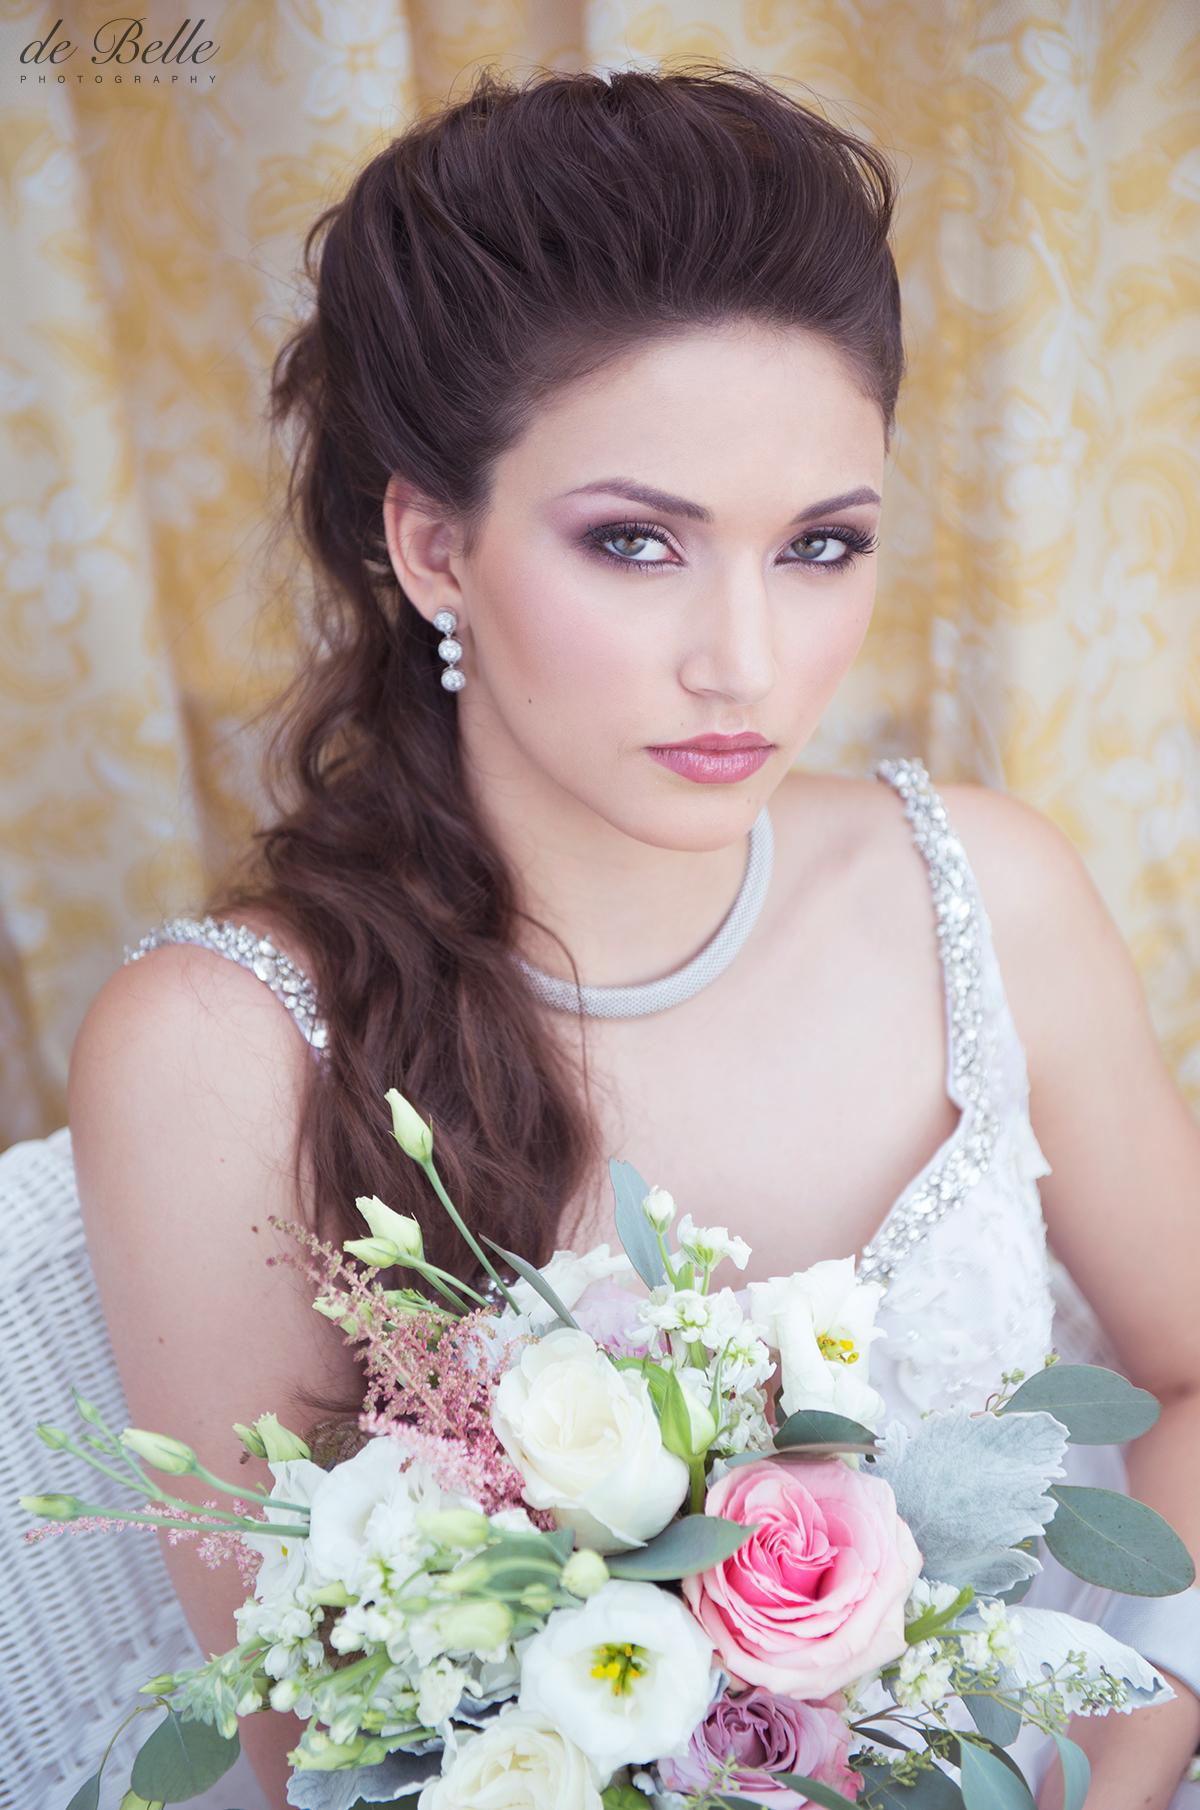 Montreal-Wedding-Photographer-Debelle-EW5